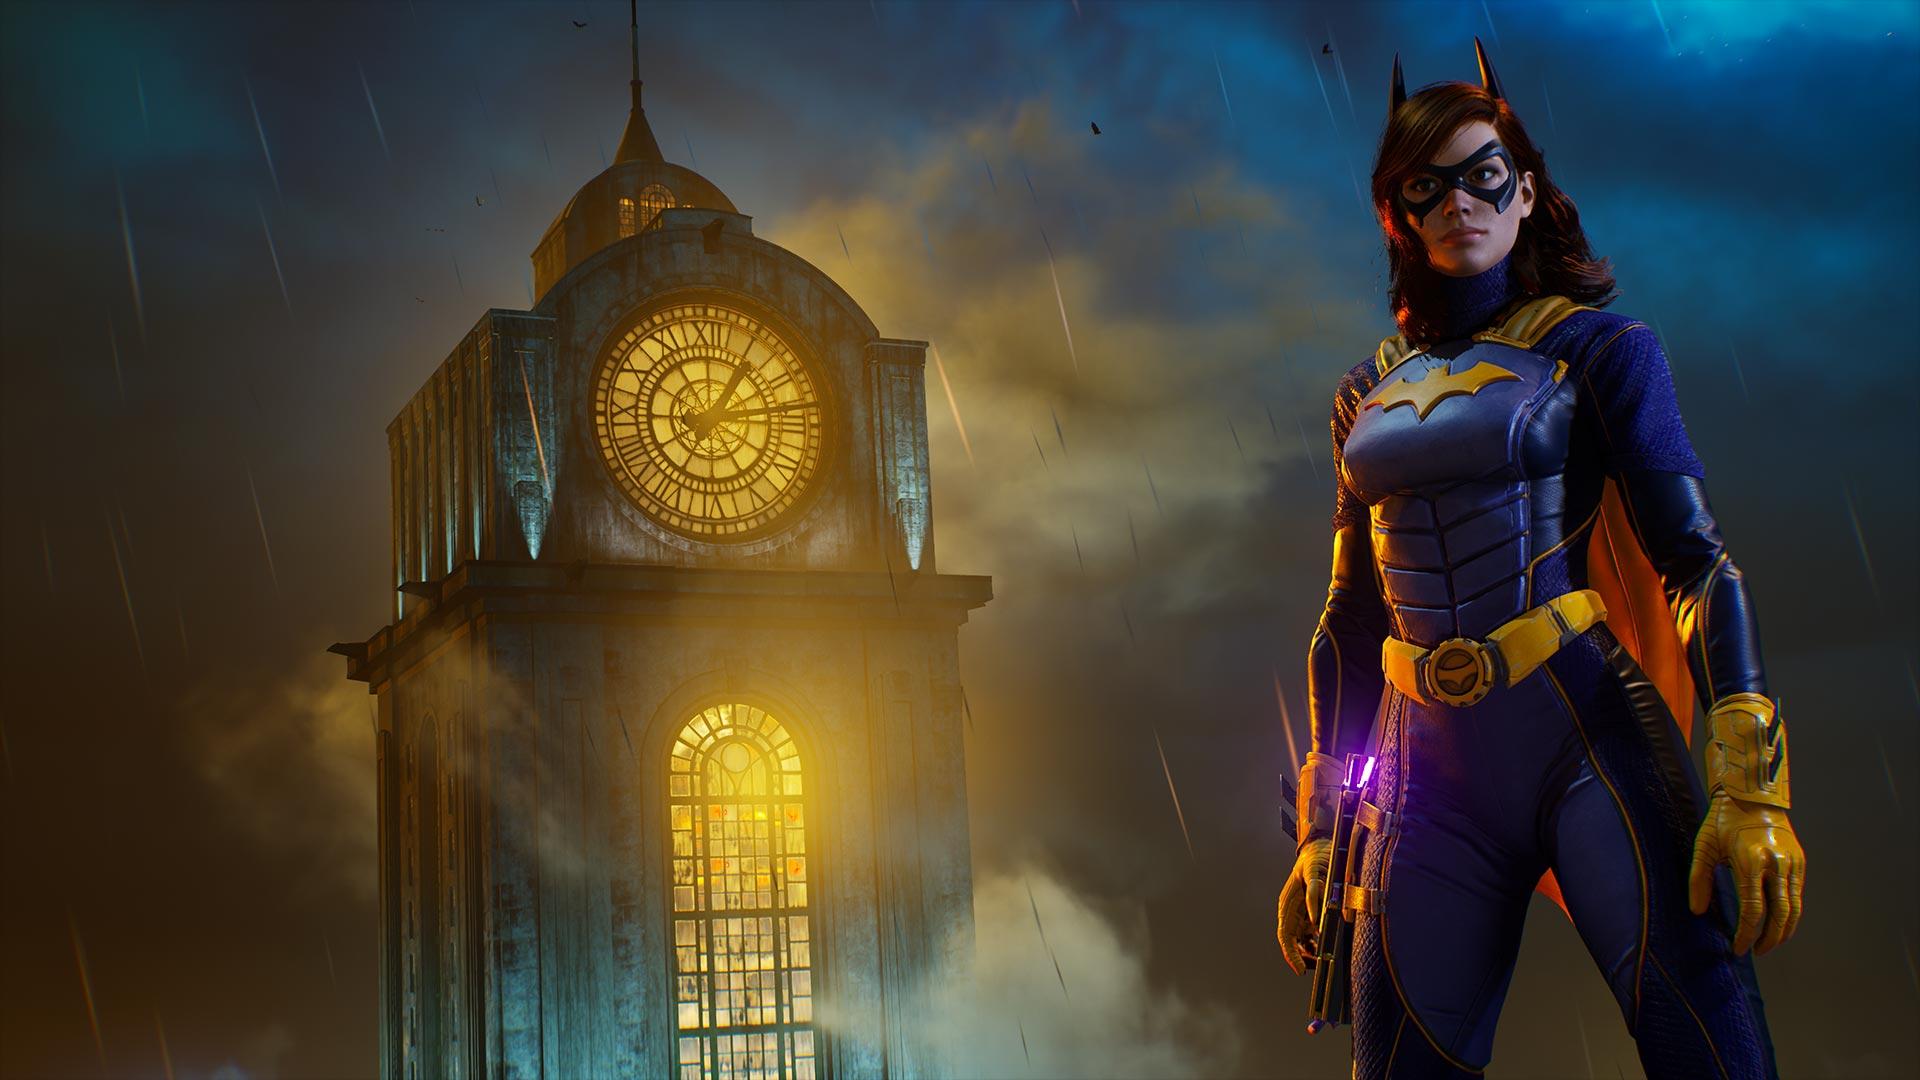 gotham knigts Batgirl - Barbara Gordon